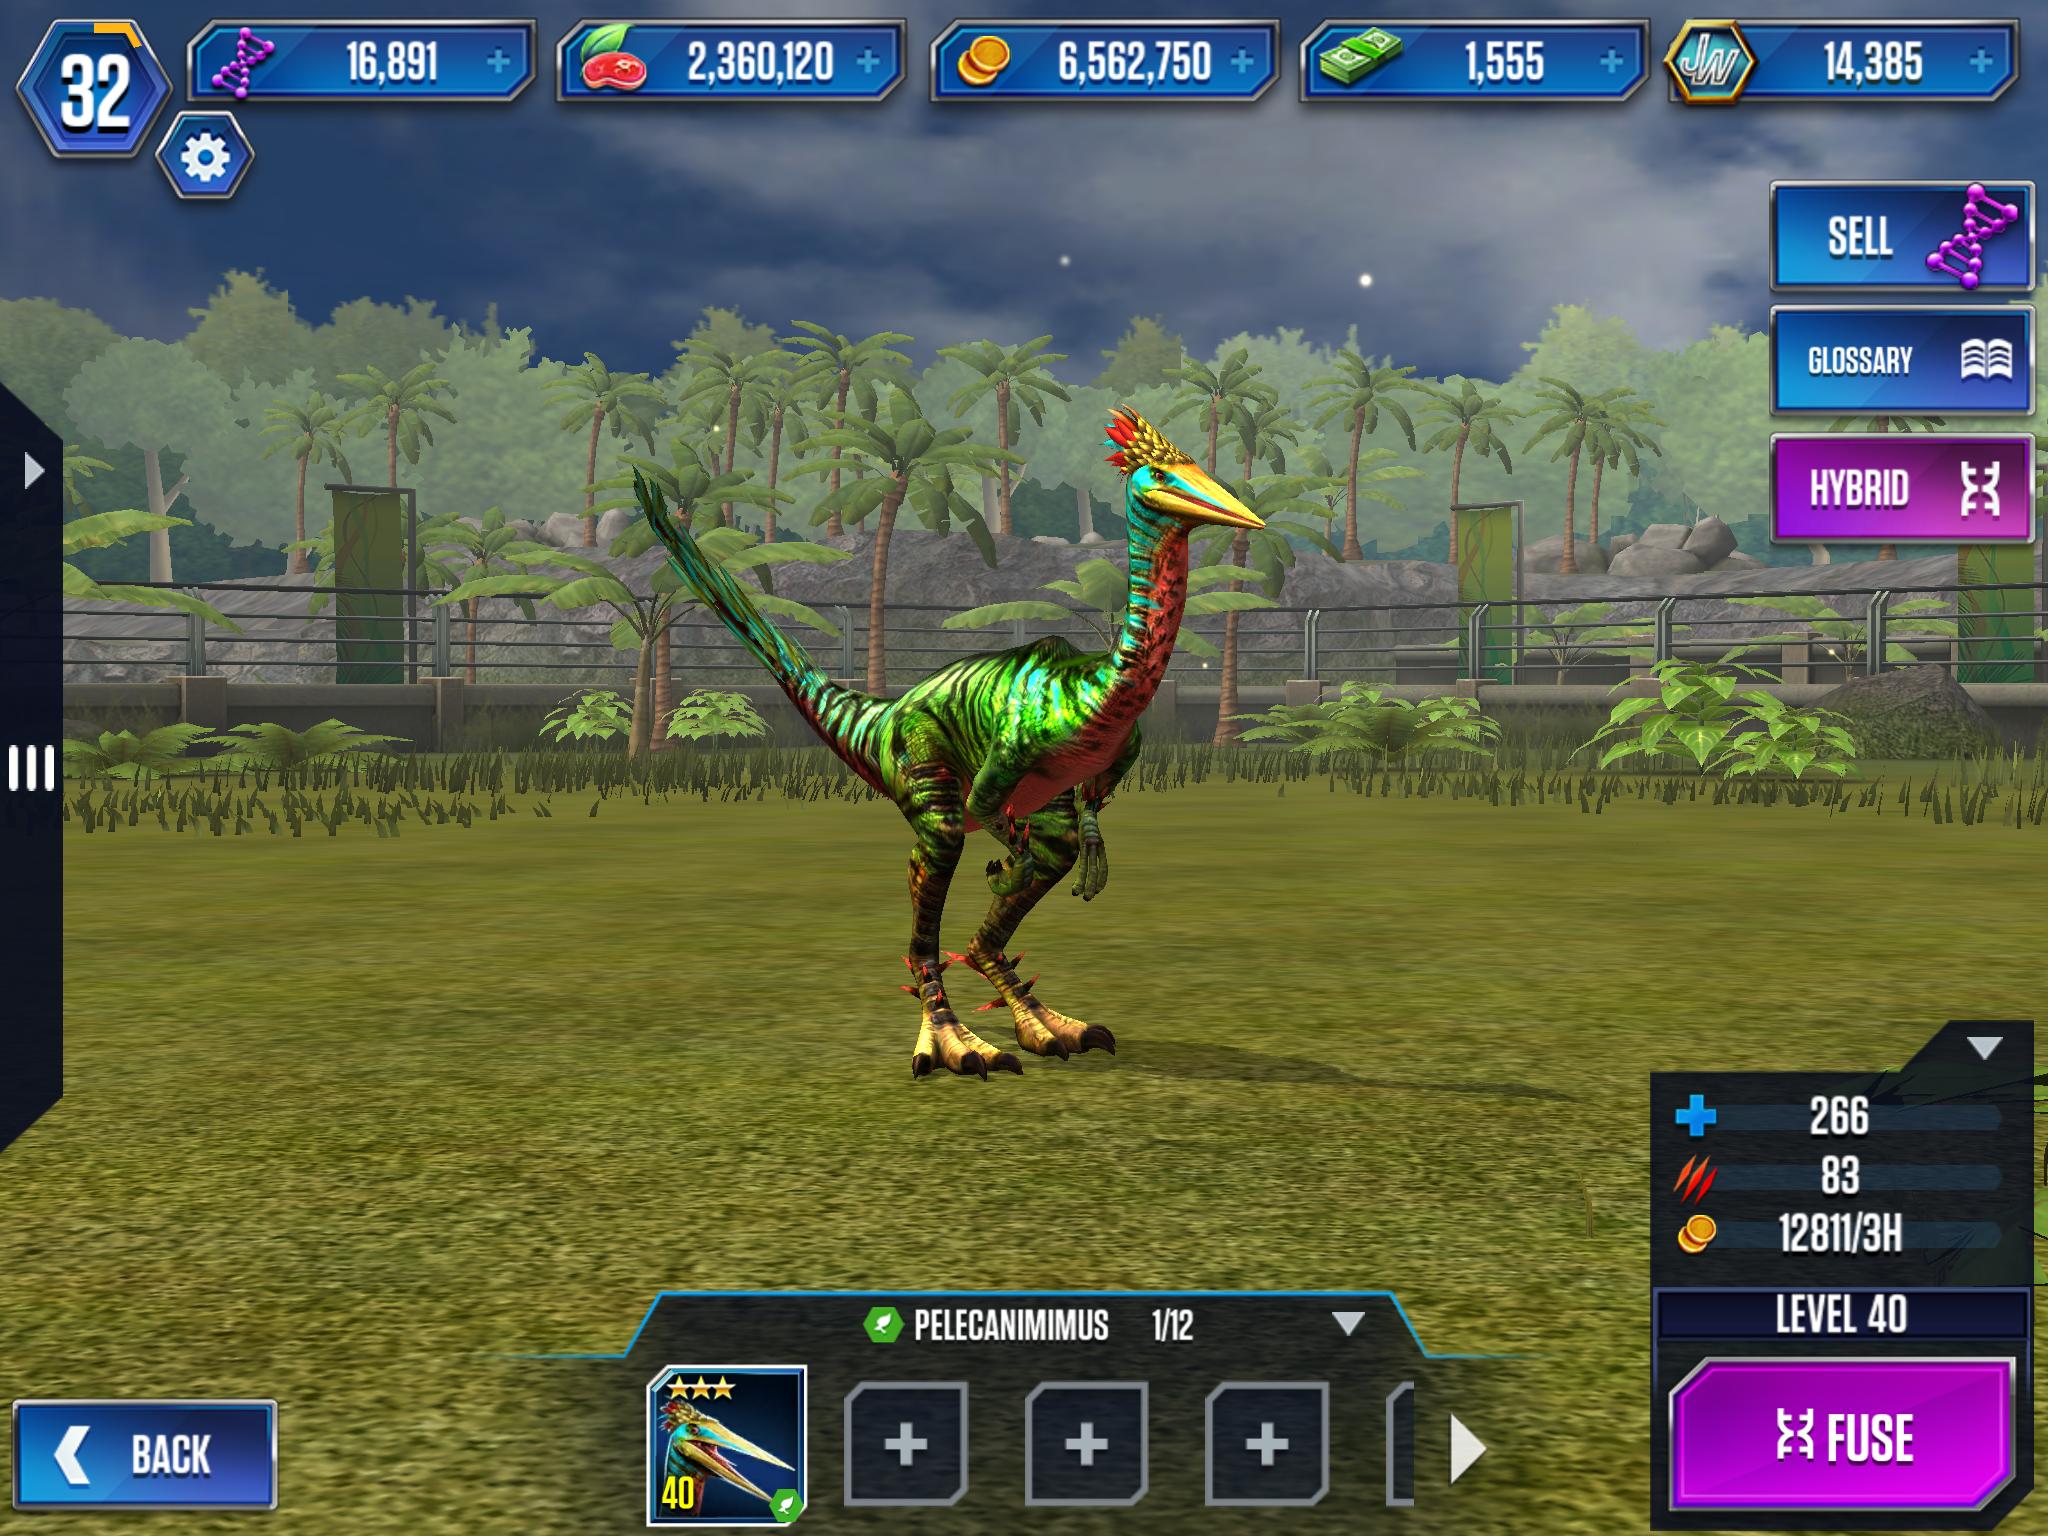 Idea by Mitchell Stark on Jurassic World Jurassic world